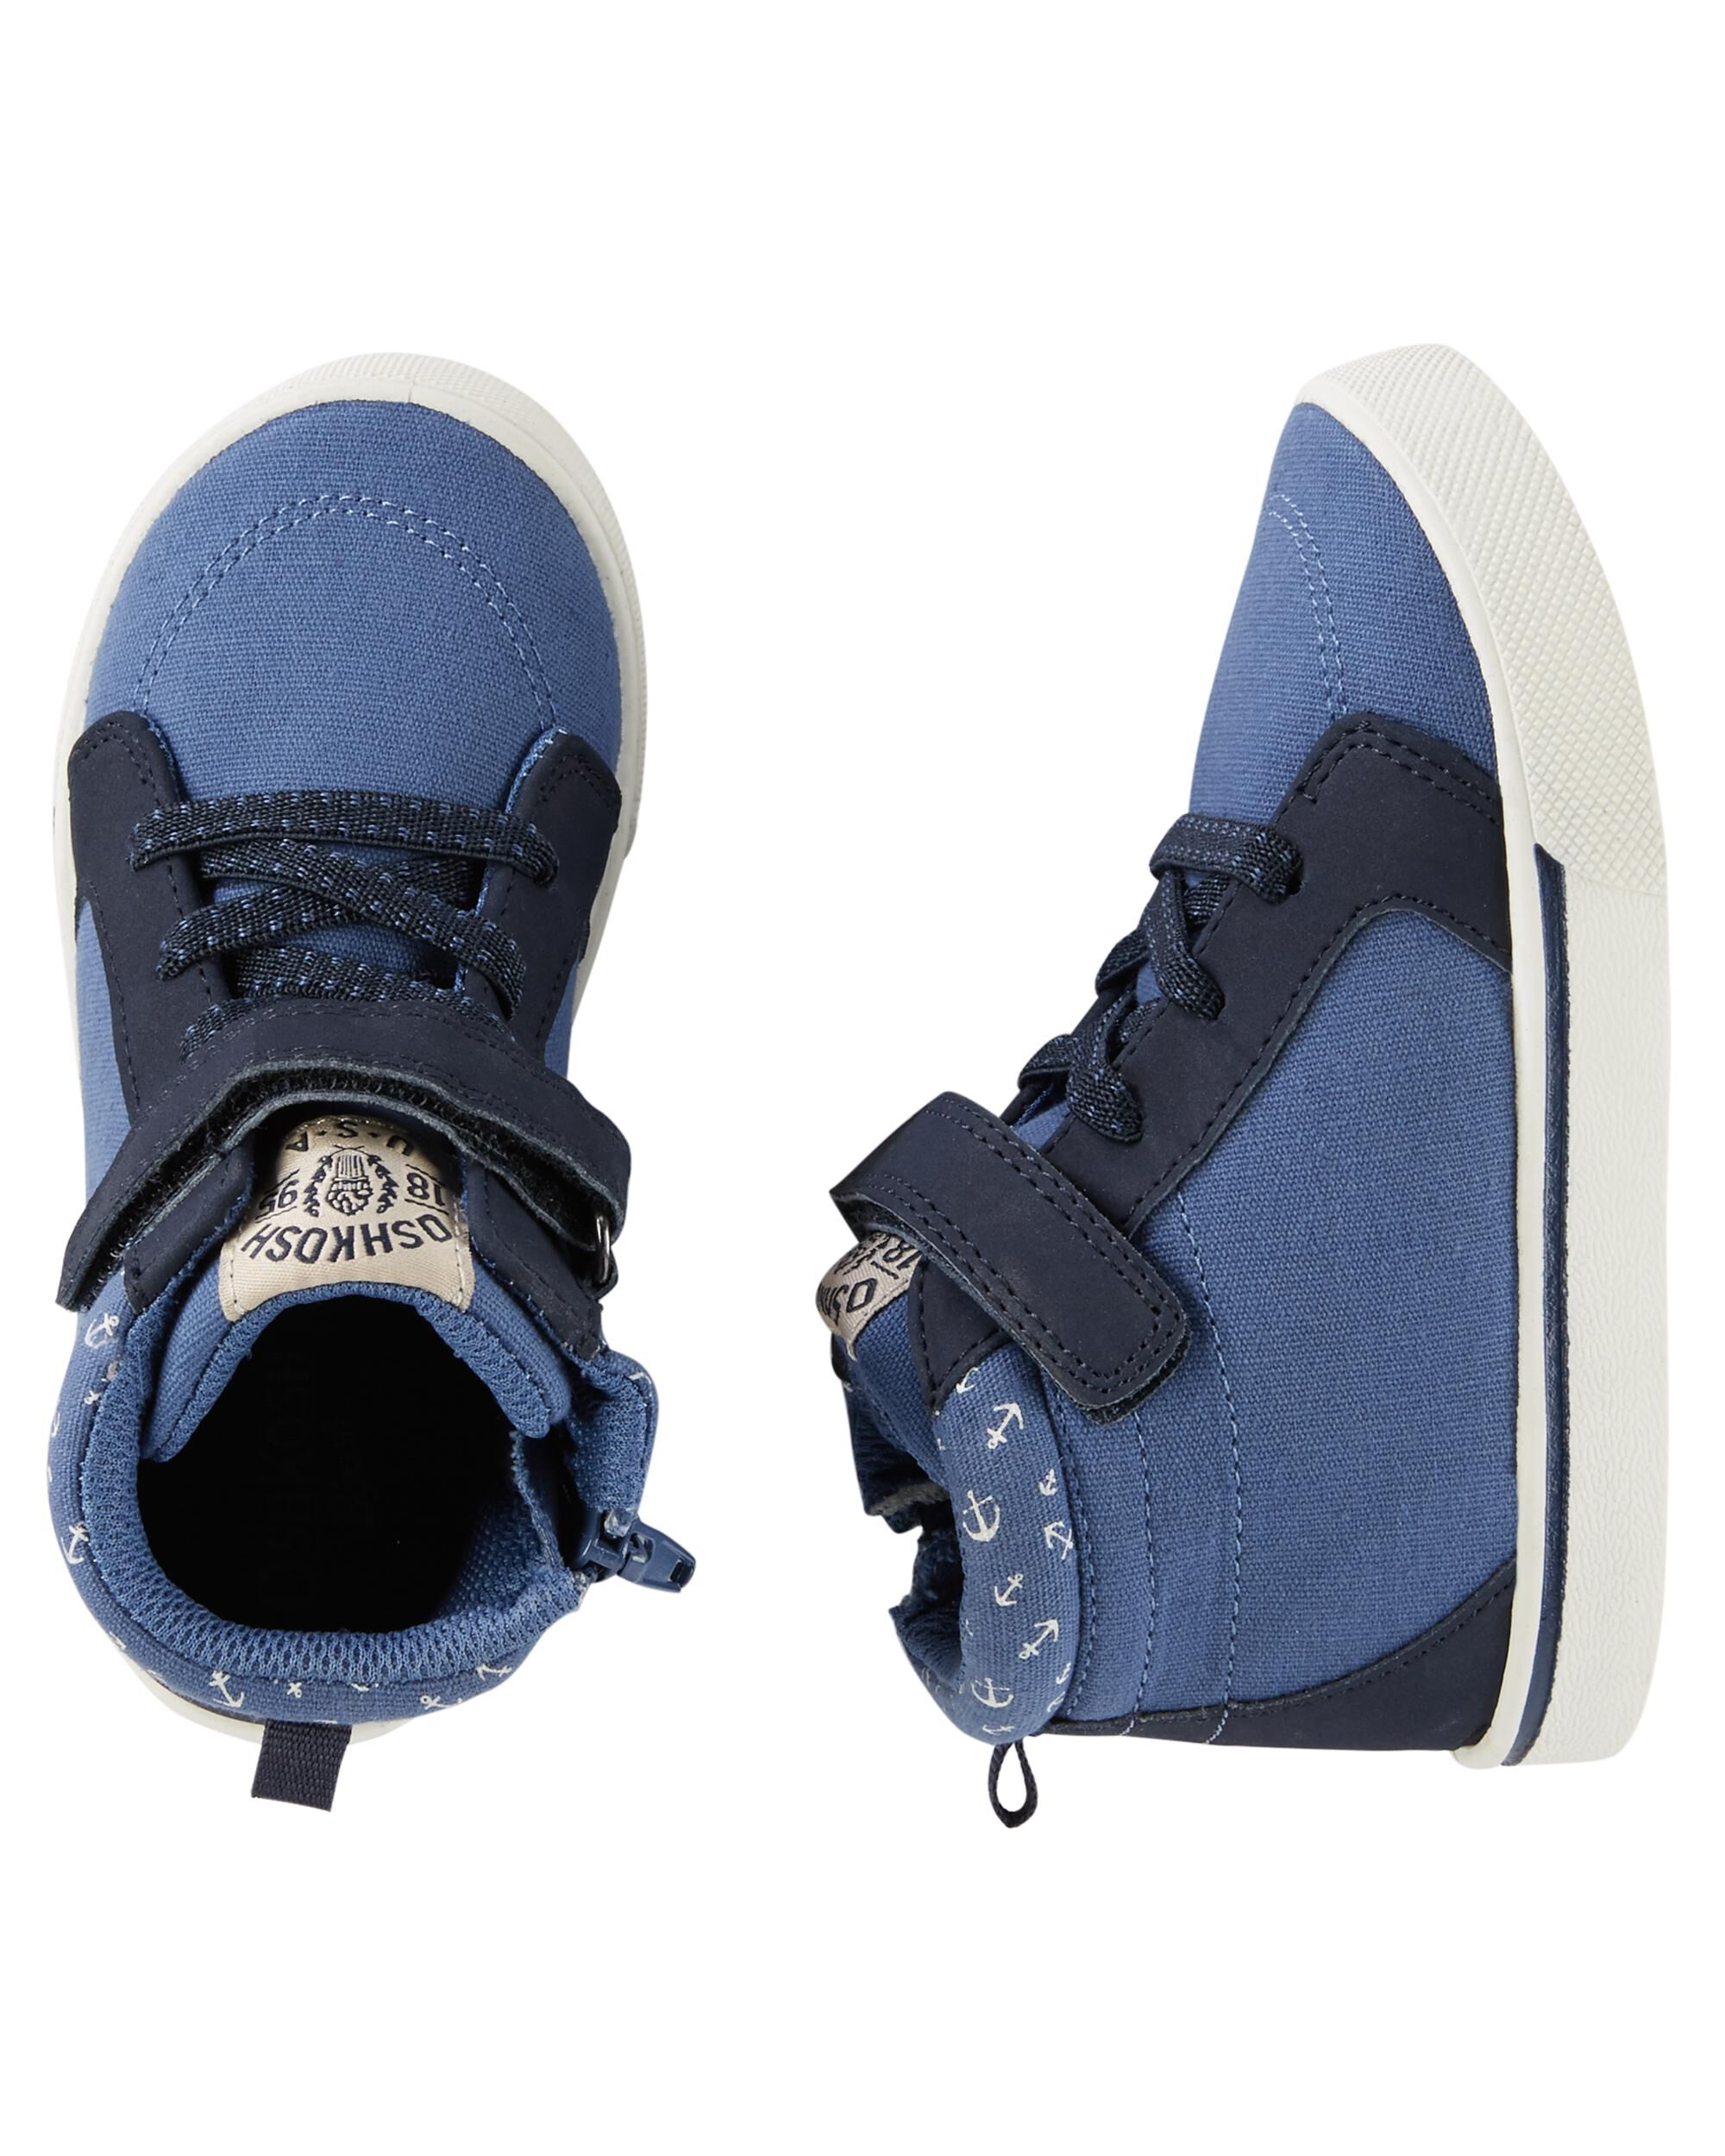 OshKosh High Top Sneakers